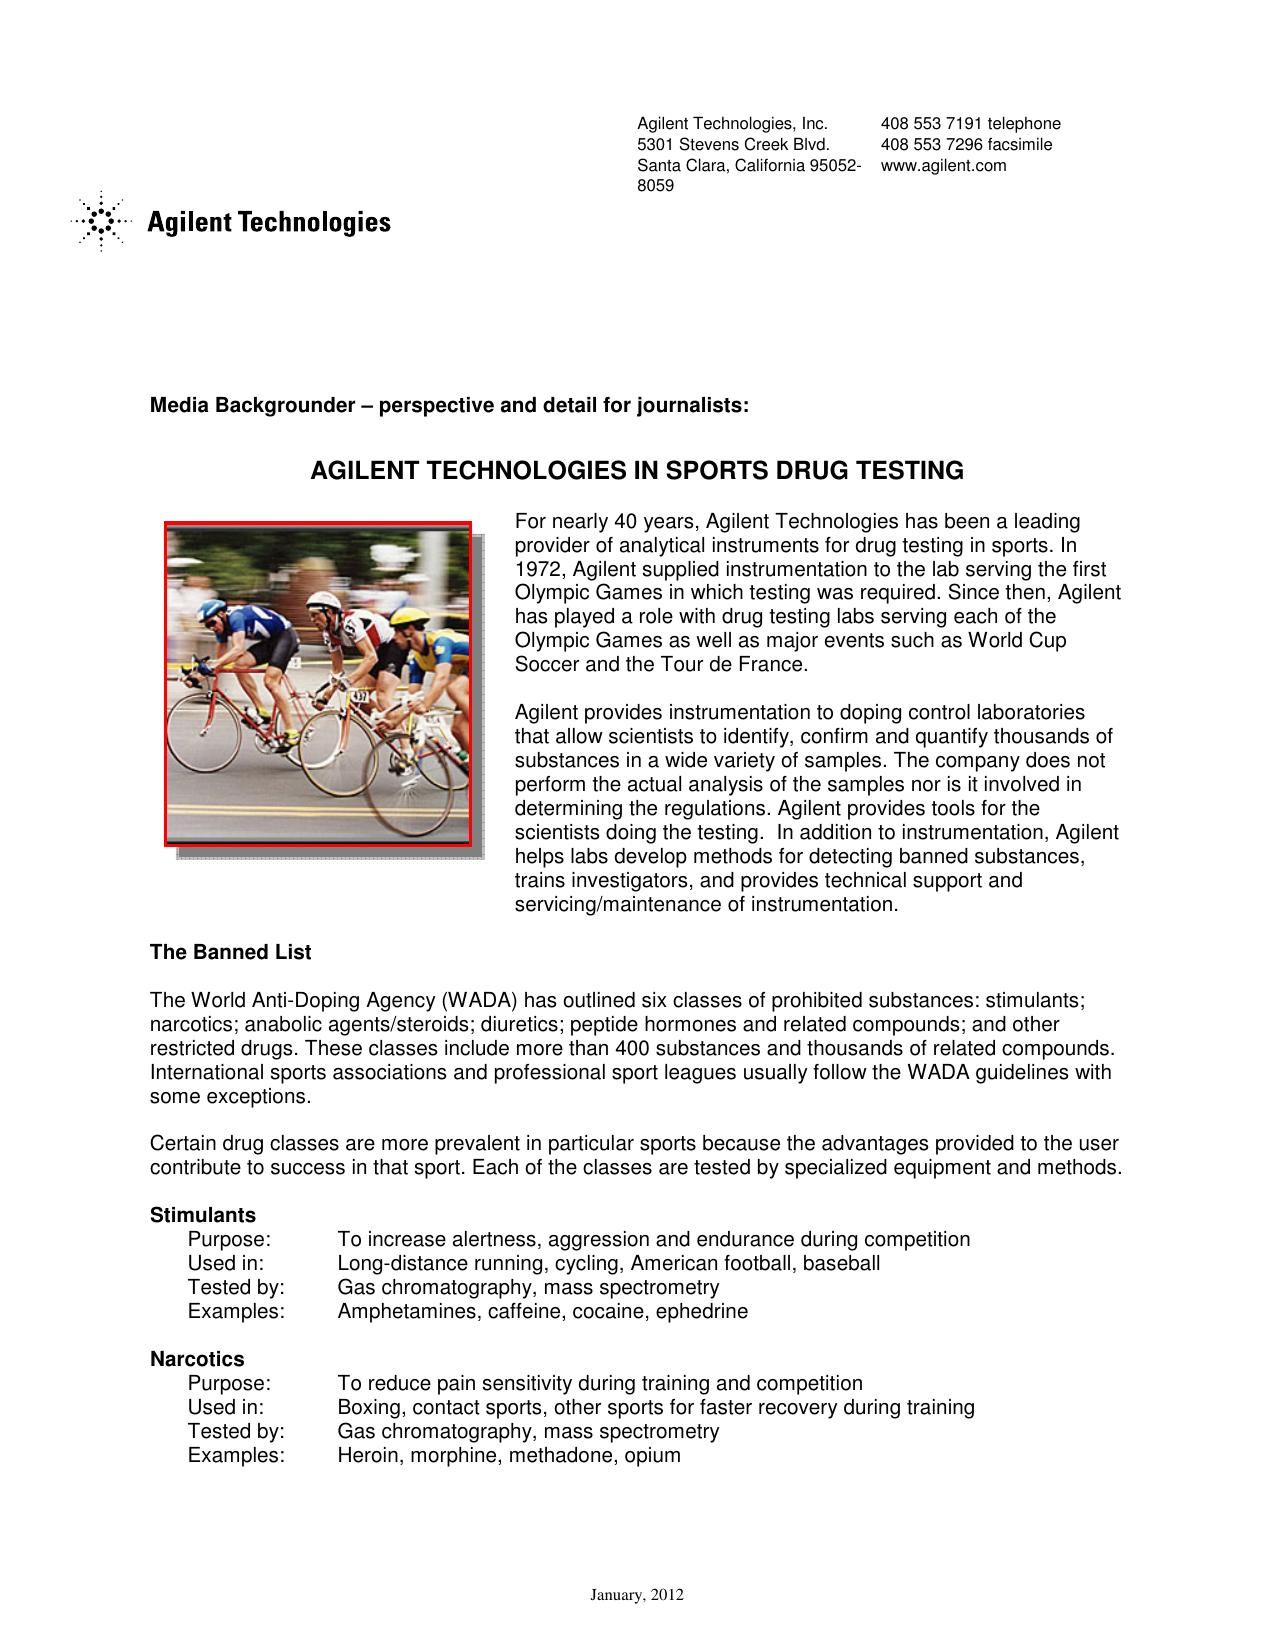 Agilent in Sports Drug Testing